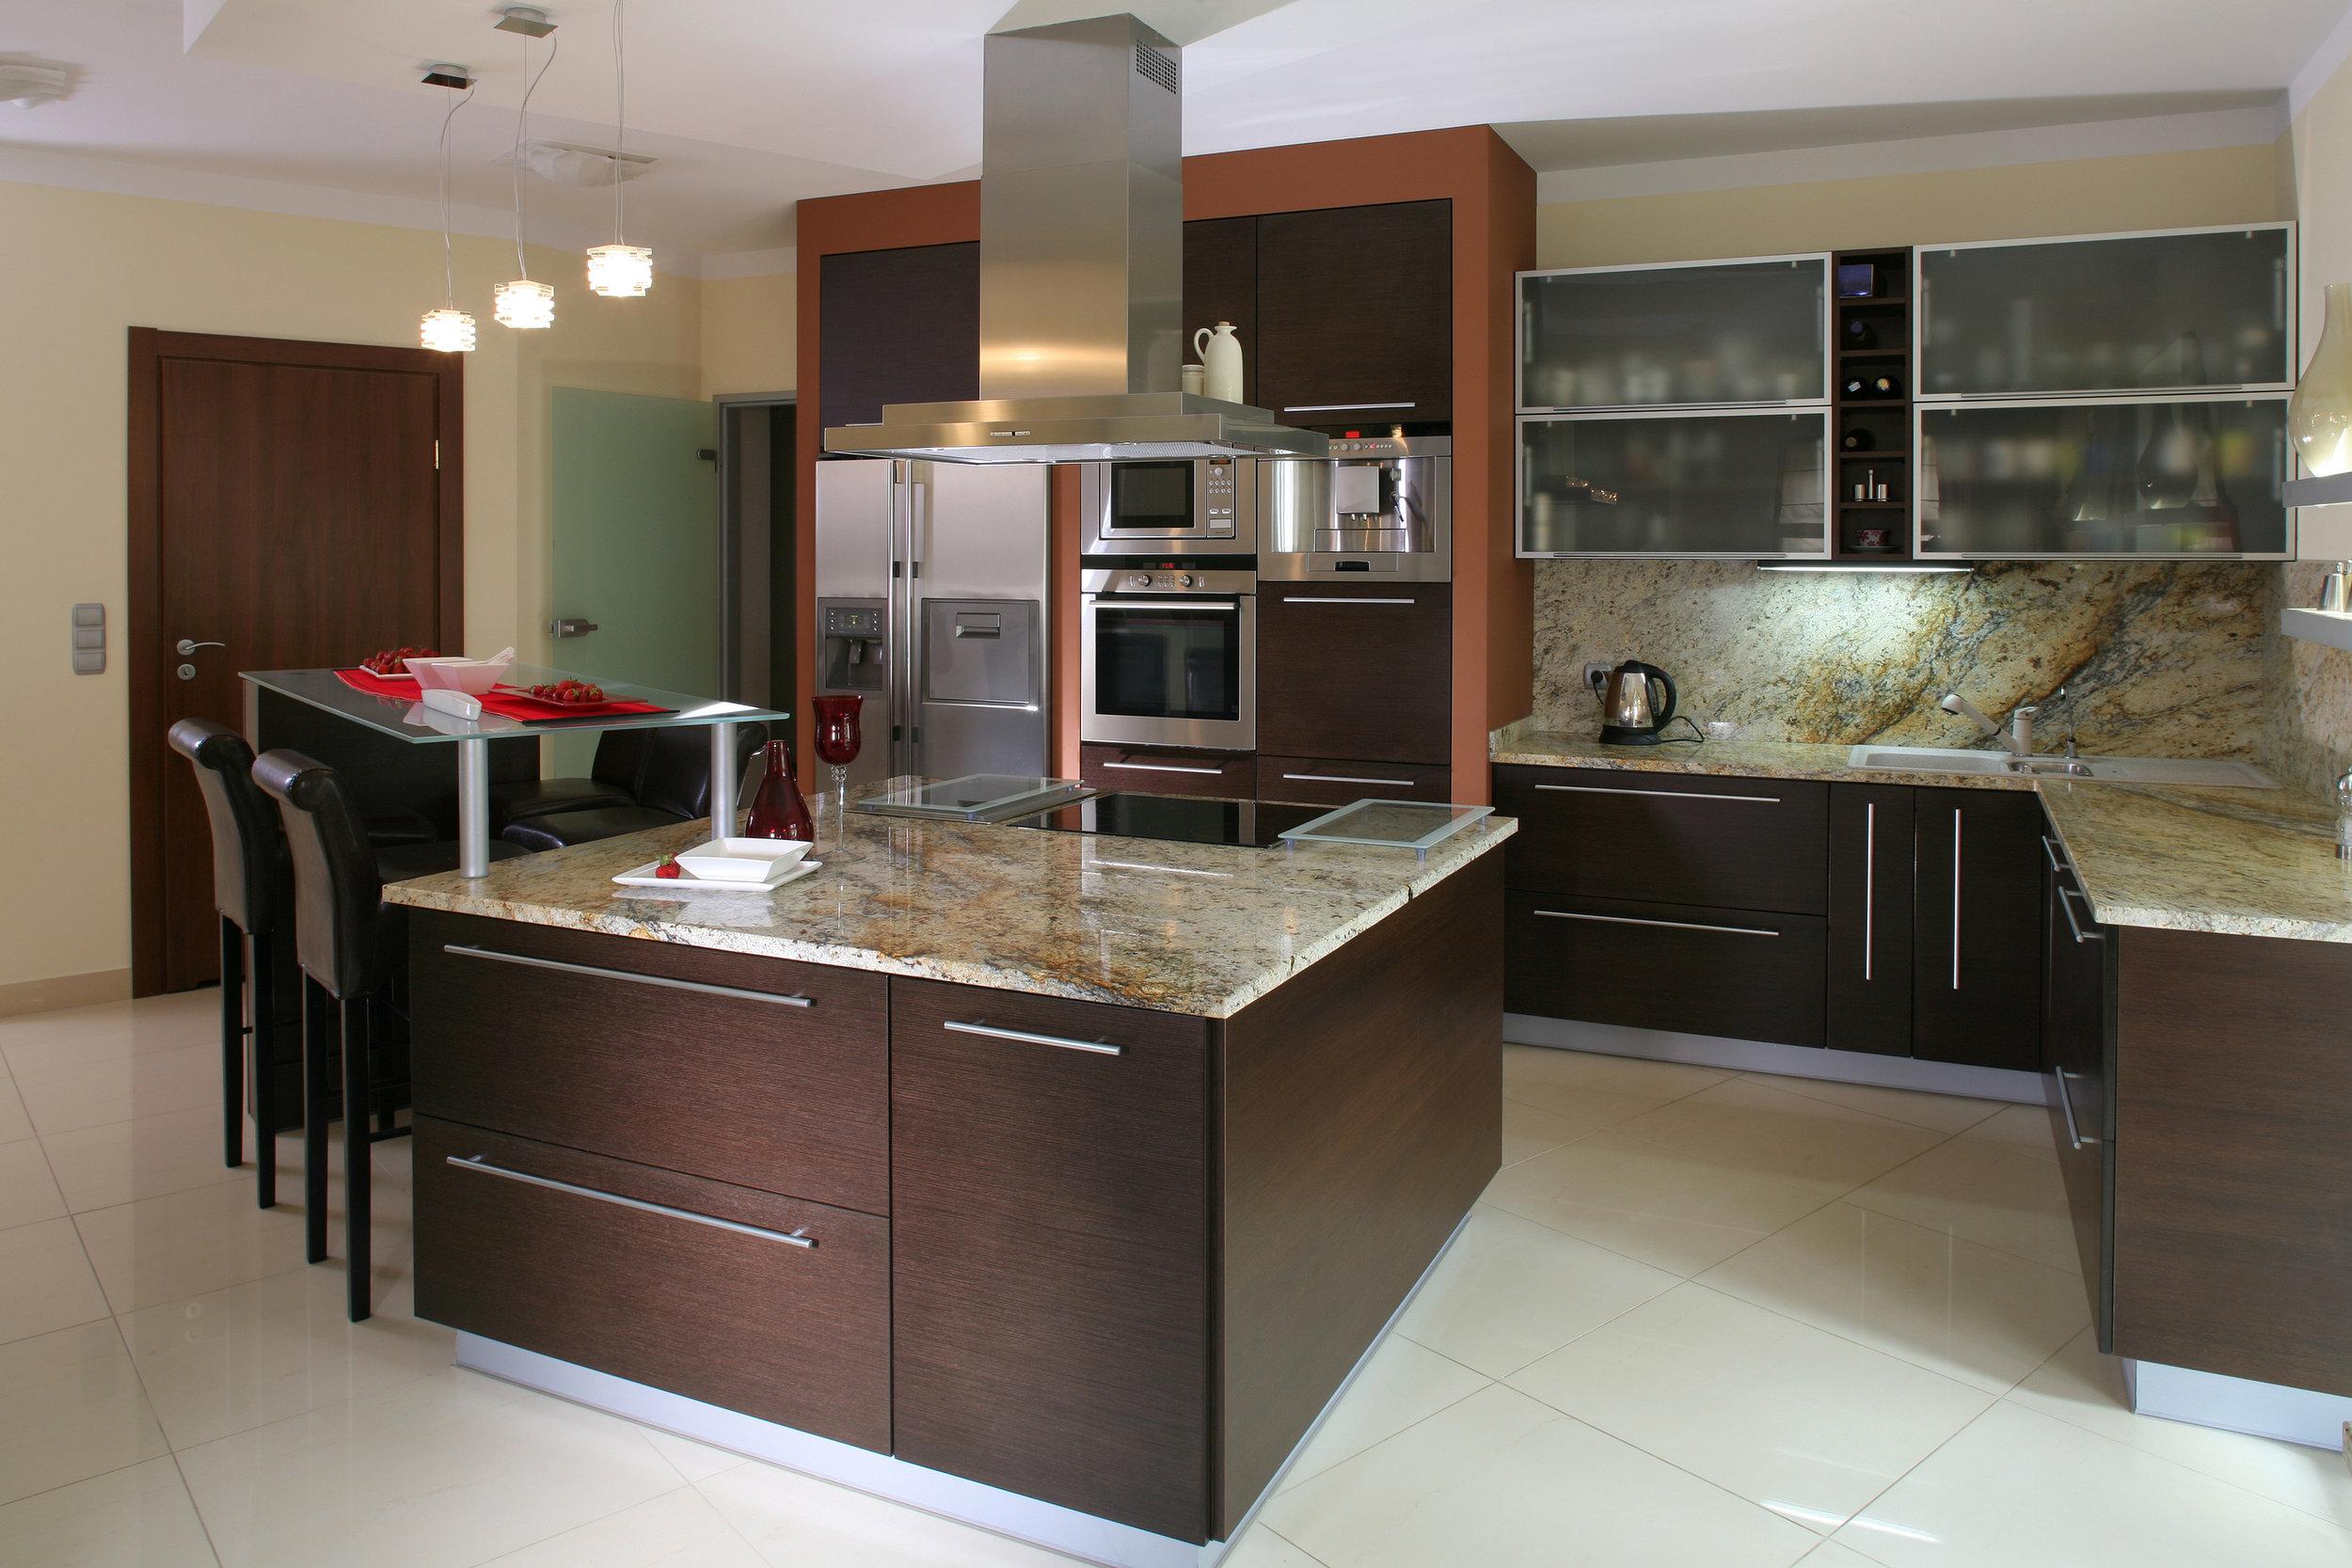 bigstock-View-of-a-modern-kitchen-19404182.jpg